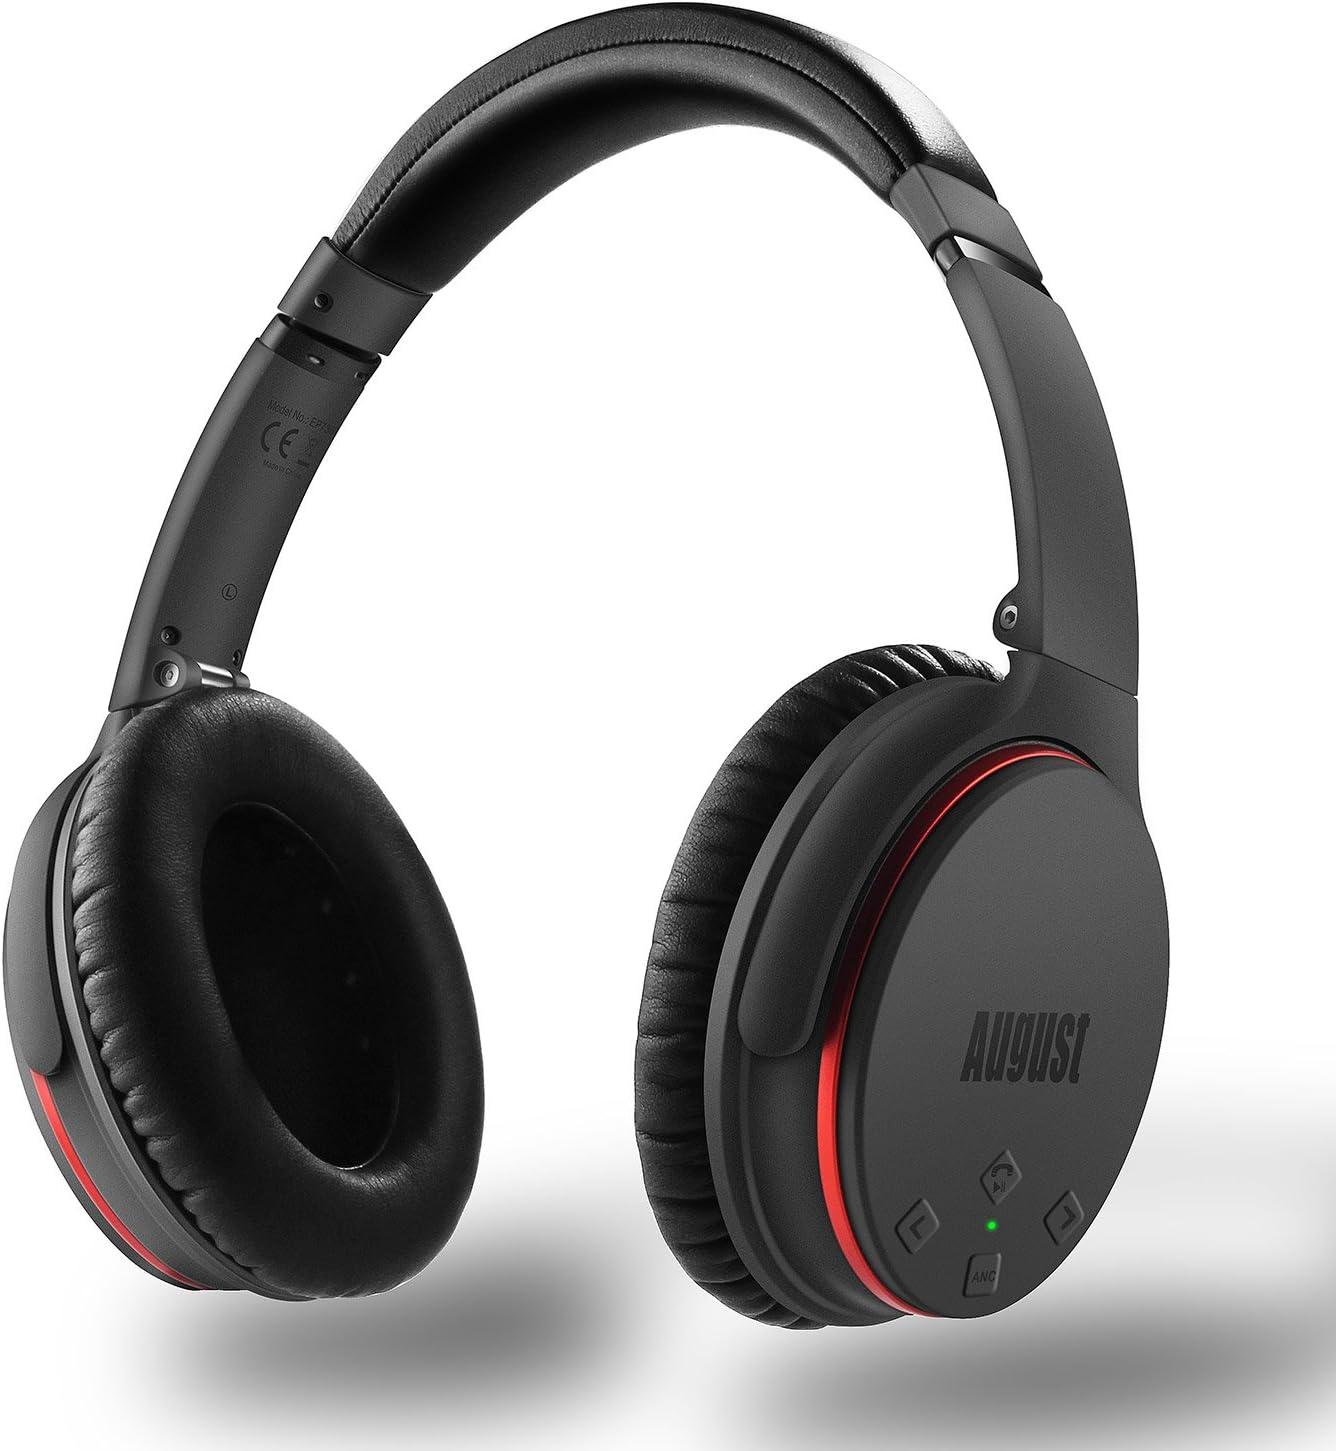 August EP735 - Auriculares con Cancelación Activa de Ruido con Bluetooth v4.1, Batería Dura de 18 Horas, con Función de Multipunto